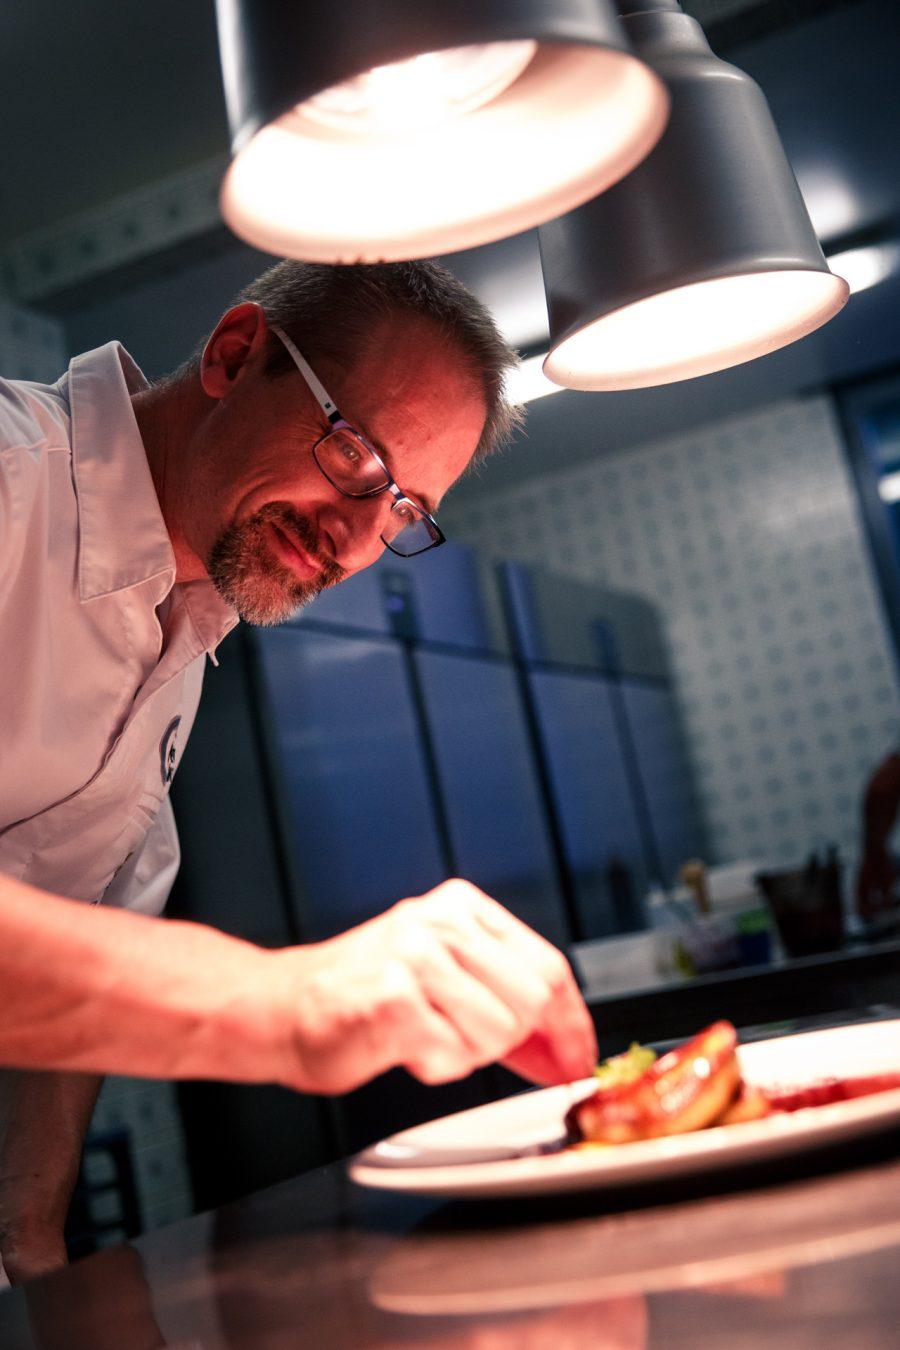 Emploi Le restaurant JULIEN BINZ recrute en salle et en cuisine